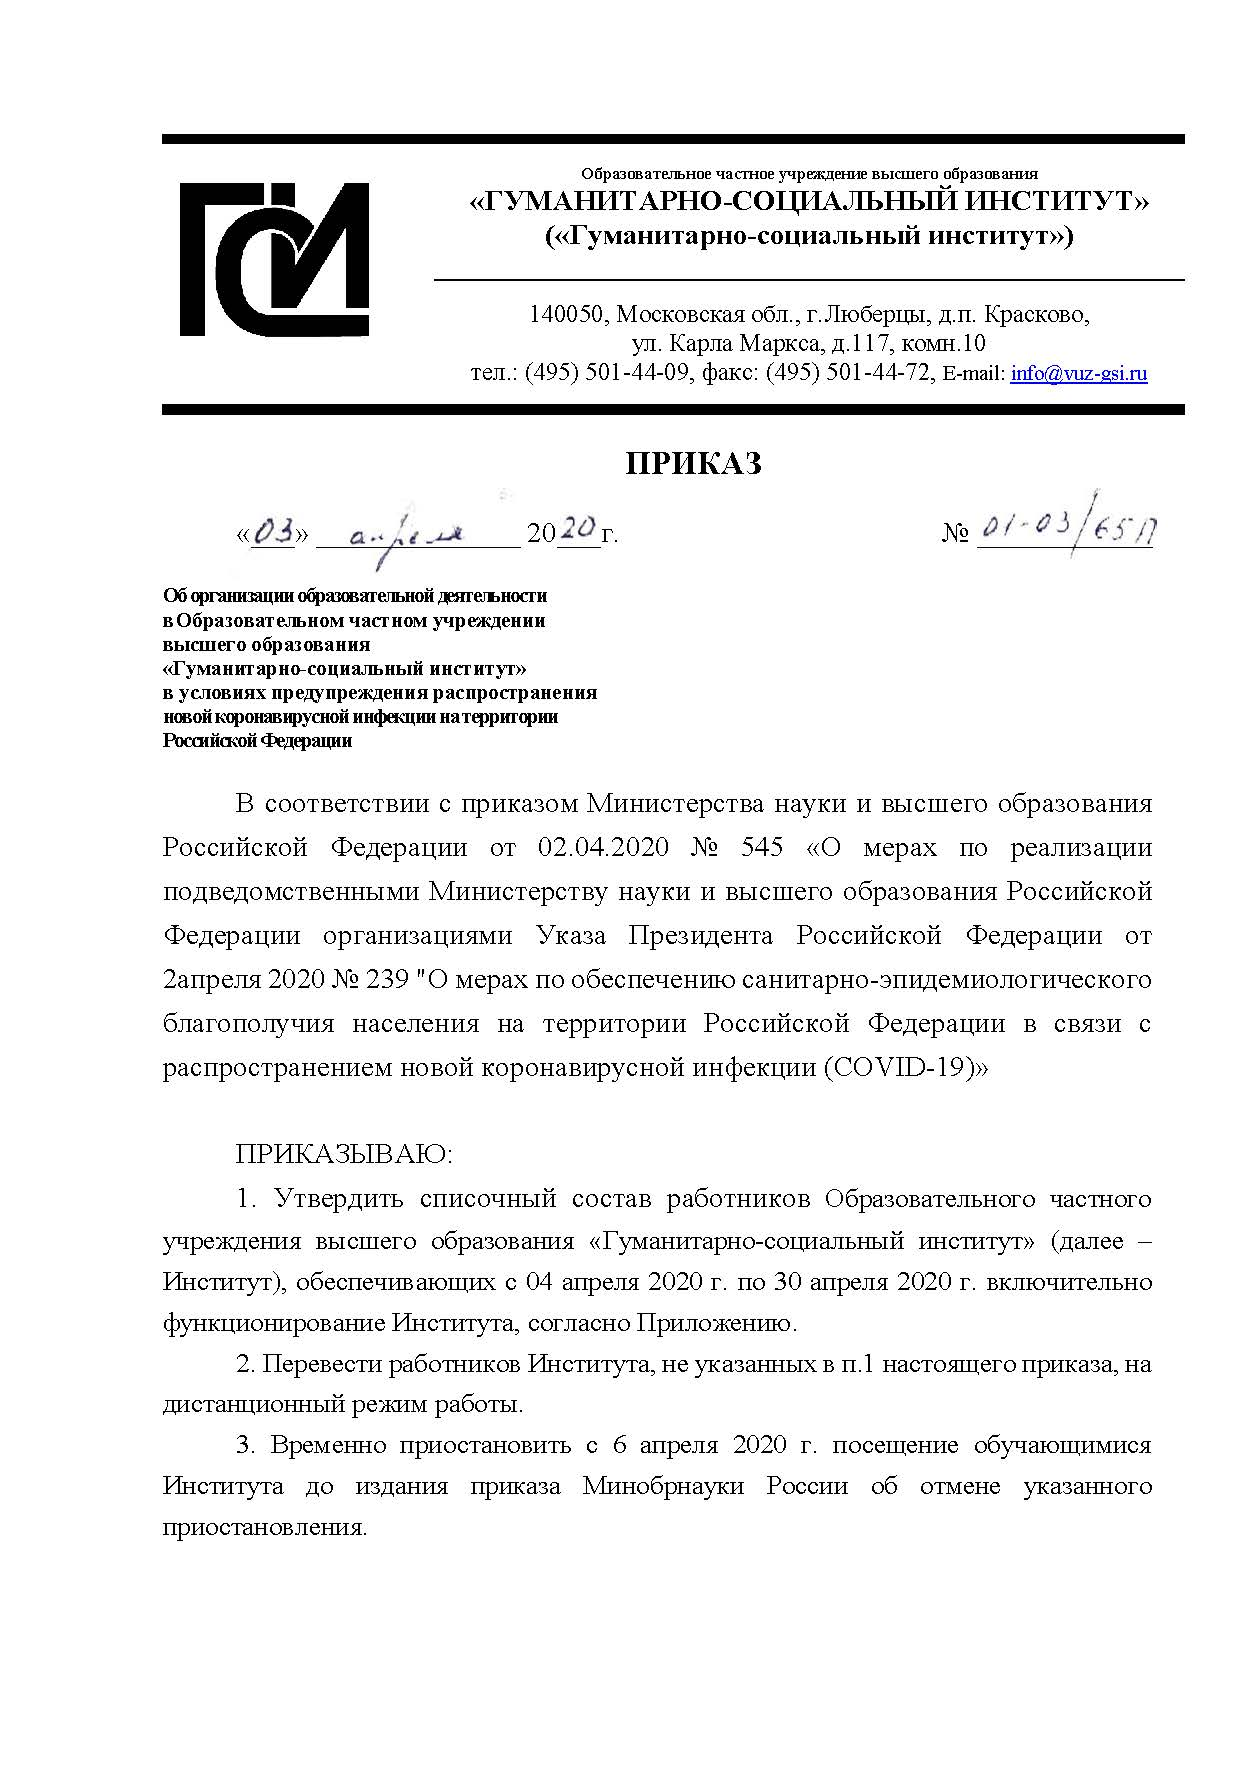 приказ на сайт_Страница_1